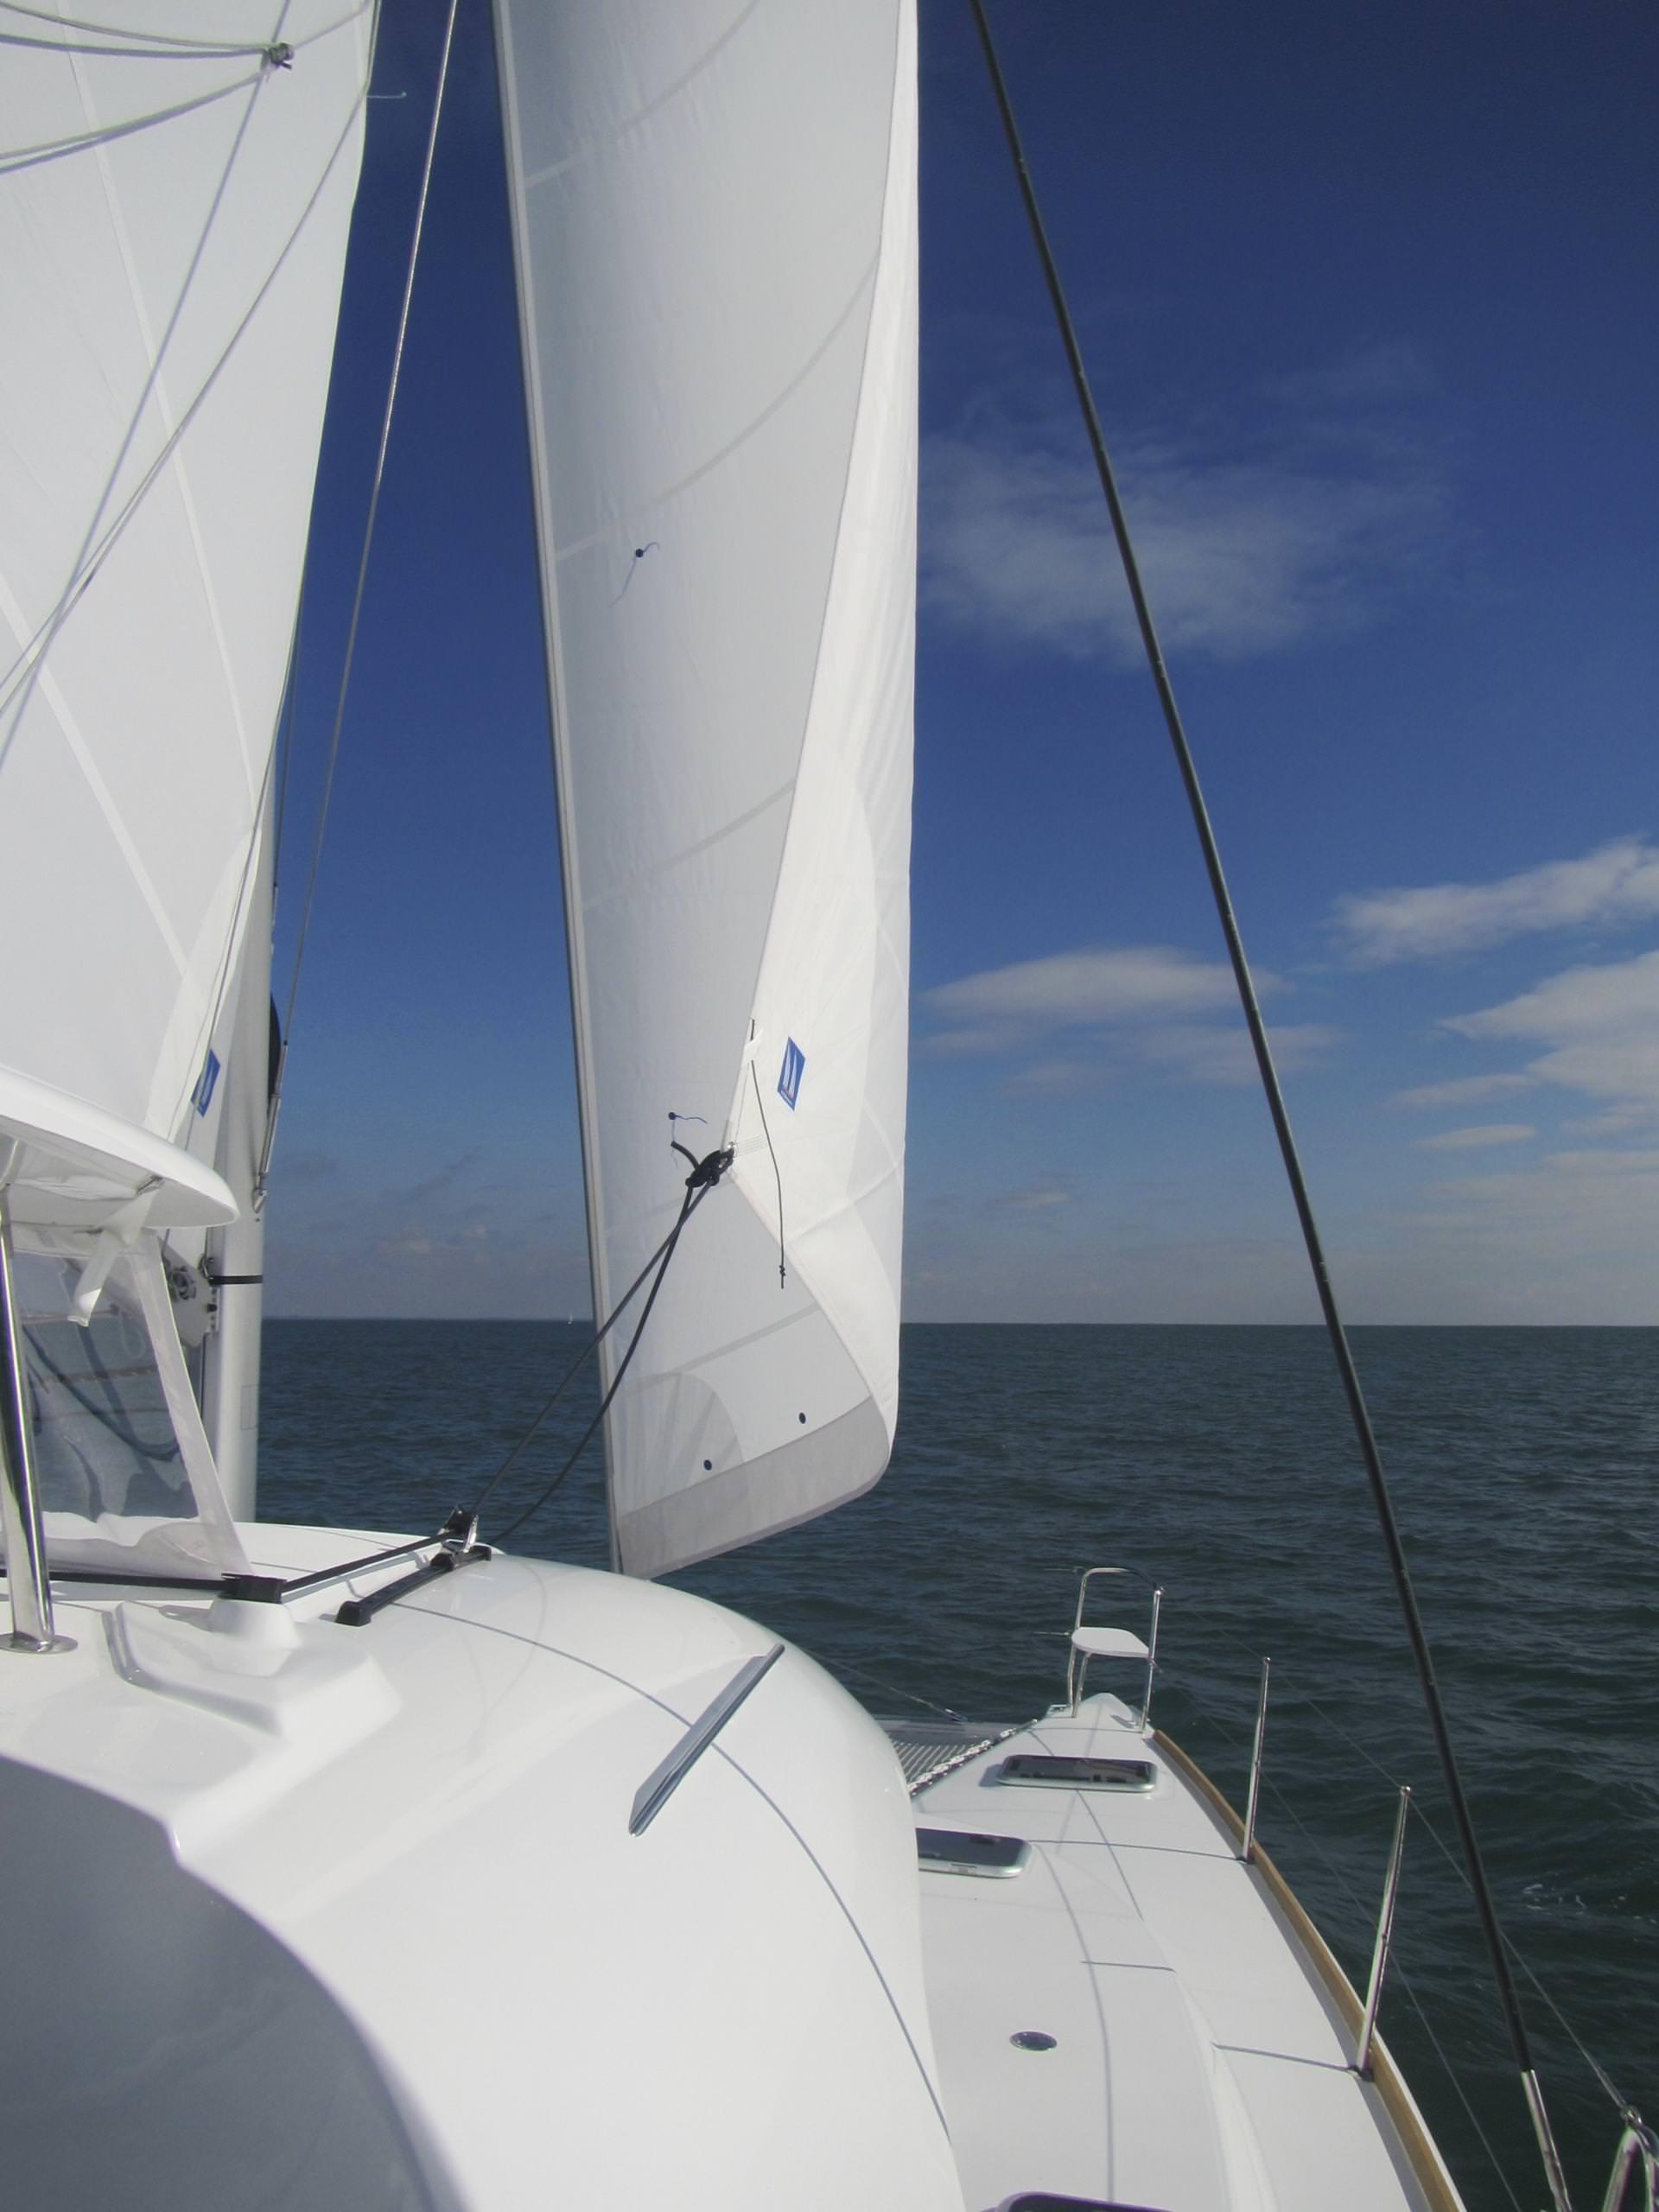 Sailing along on Harmony